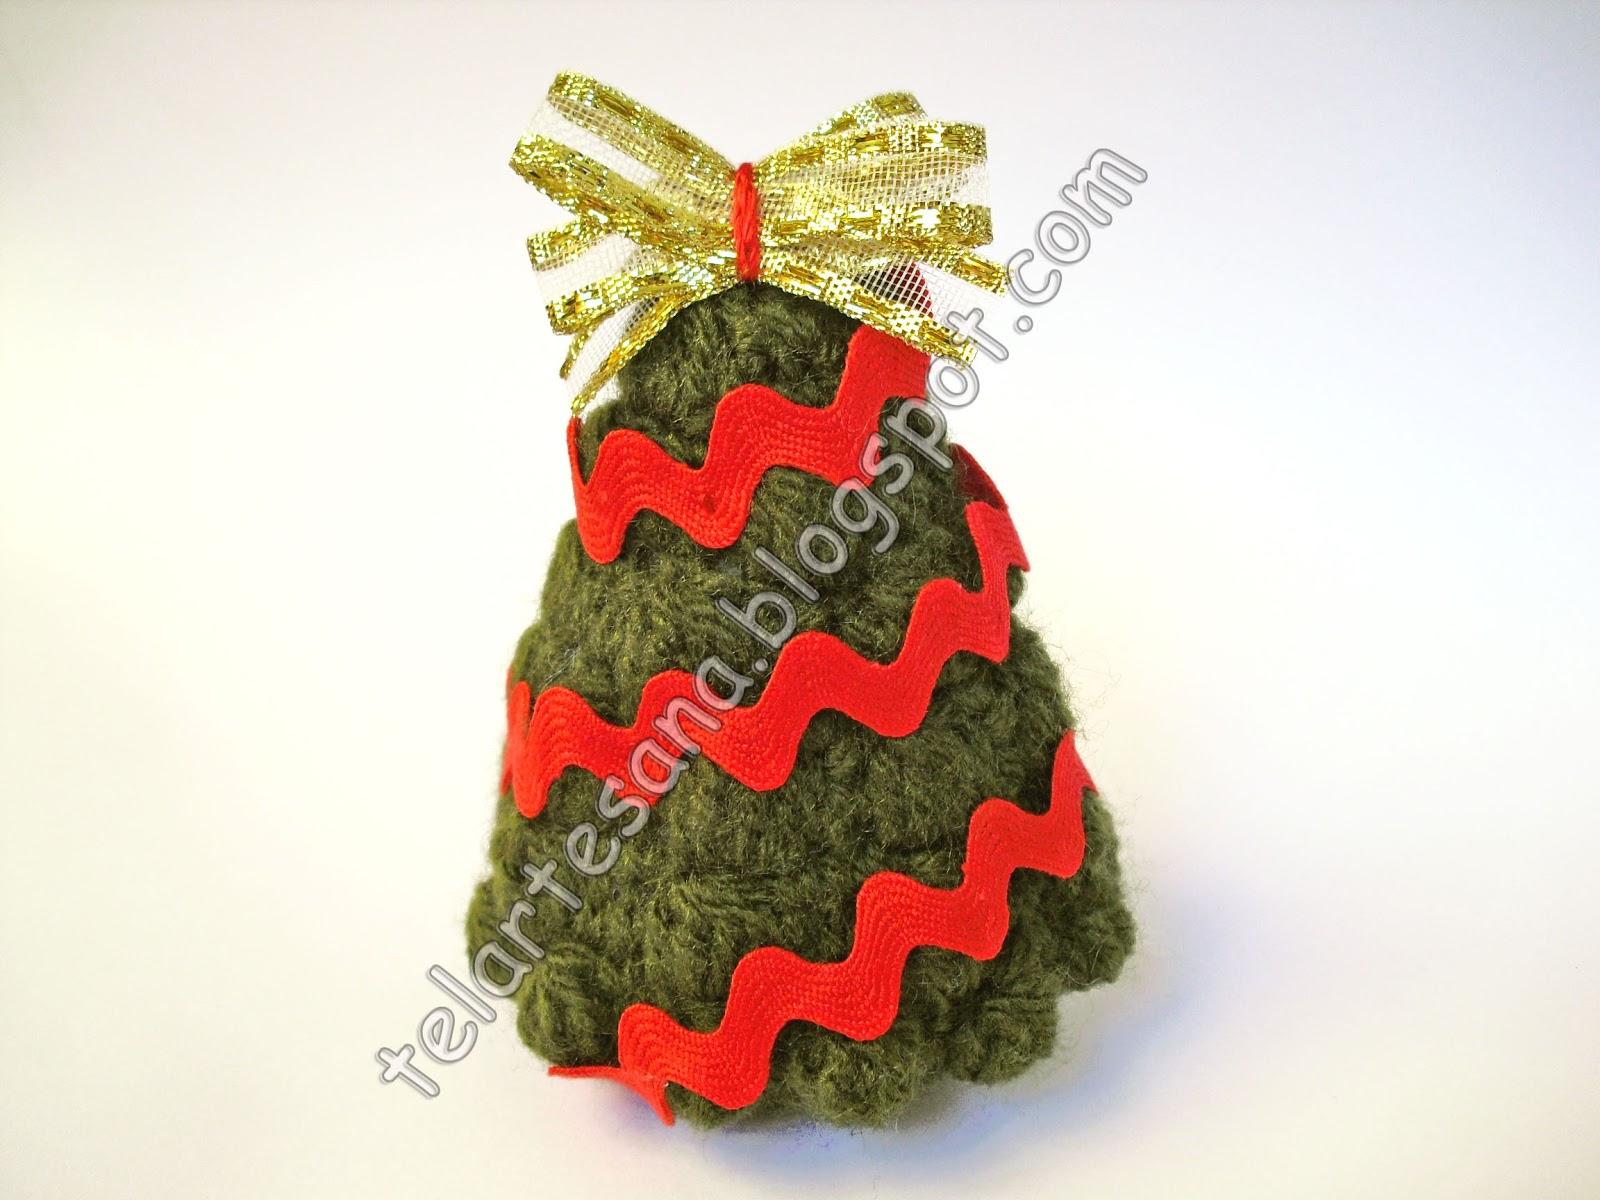 Telartesana noviembre 2012 - Adornos navidenos artesanales ...